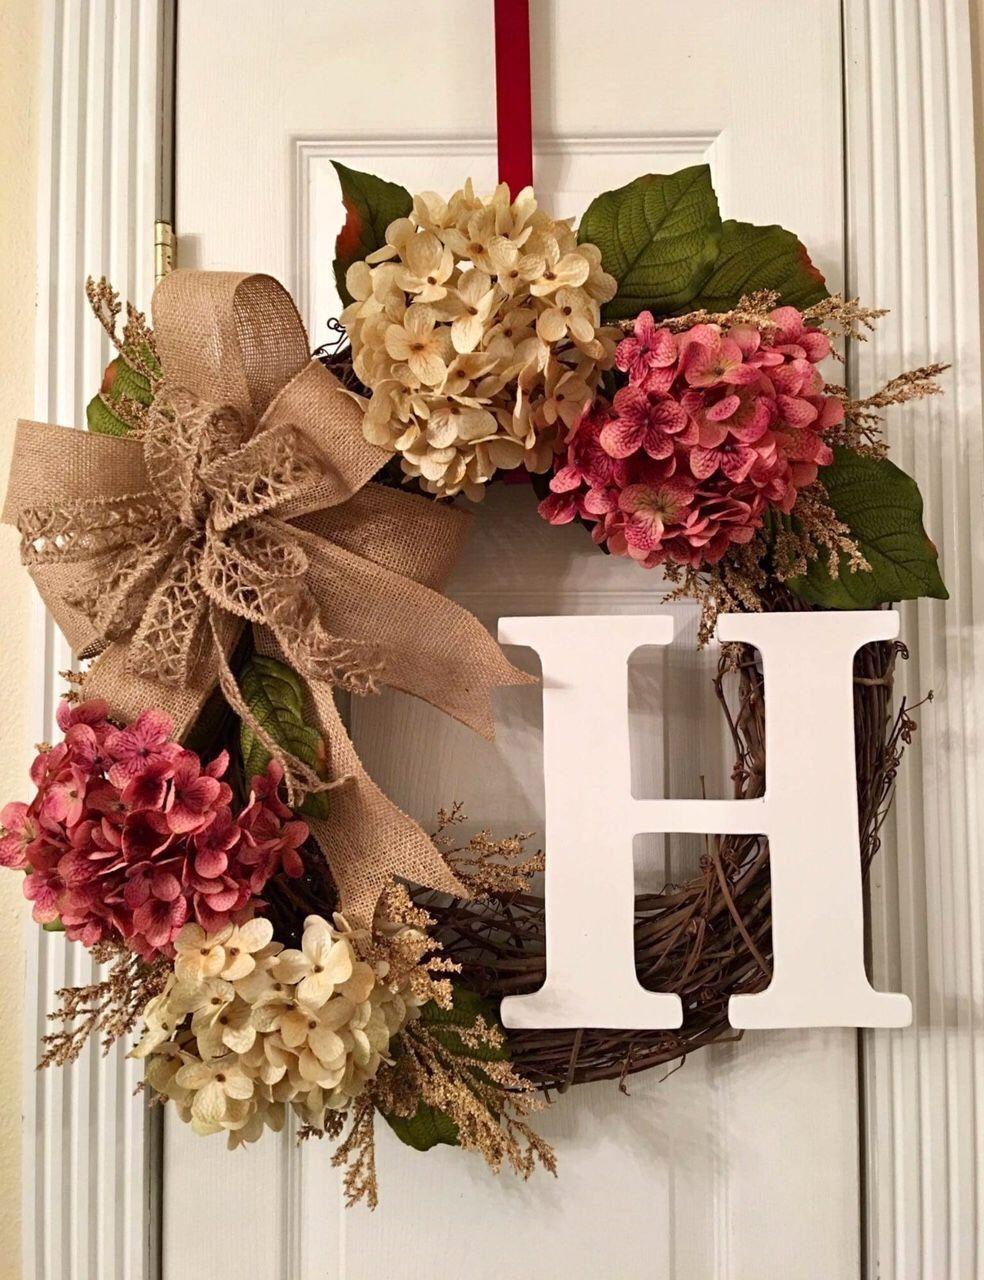 Personalized Wreath Monogrammed Wreath Grapevine Hydrangea Wreath Front Door Wreath Wedding Gift Idea Everyday Farmhouse Decor Monogram Door Wreath Initial Door Wreaths Personalized Wreaths